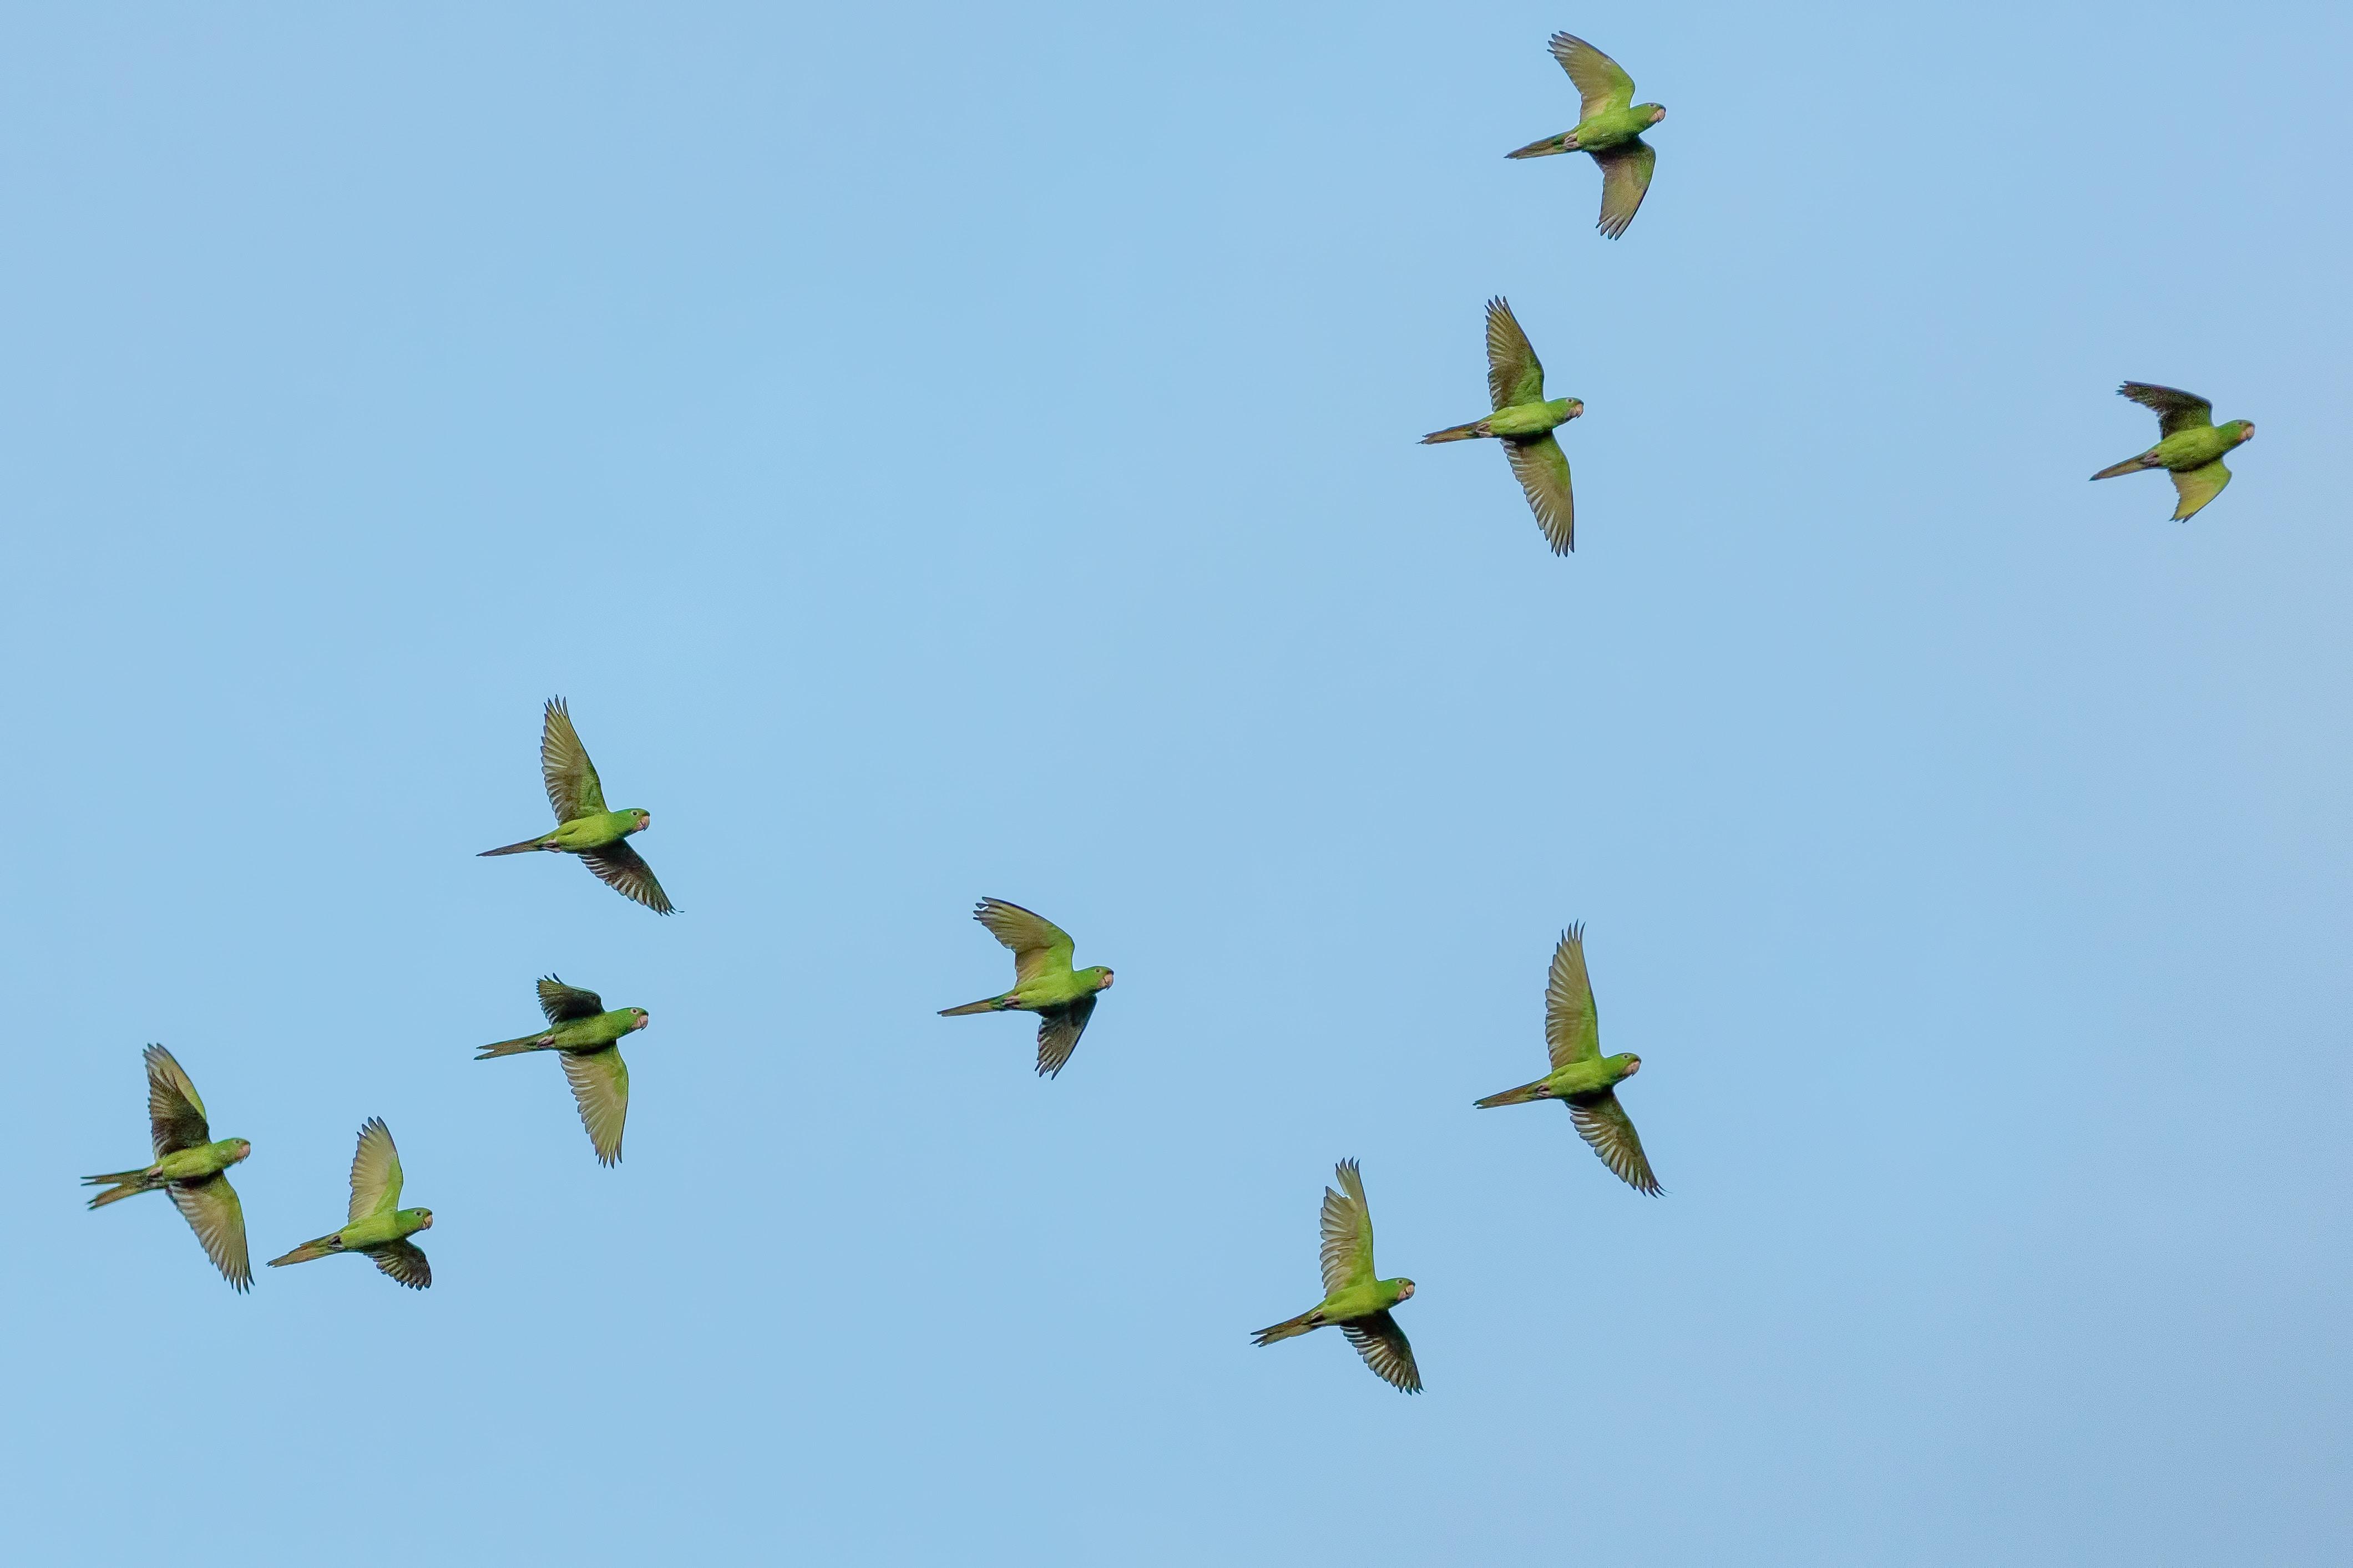 flock of yellow bird flying